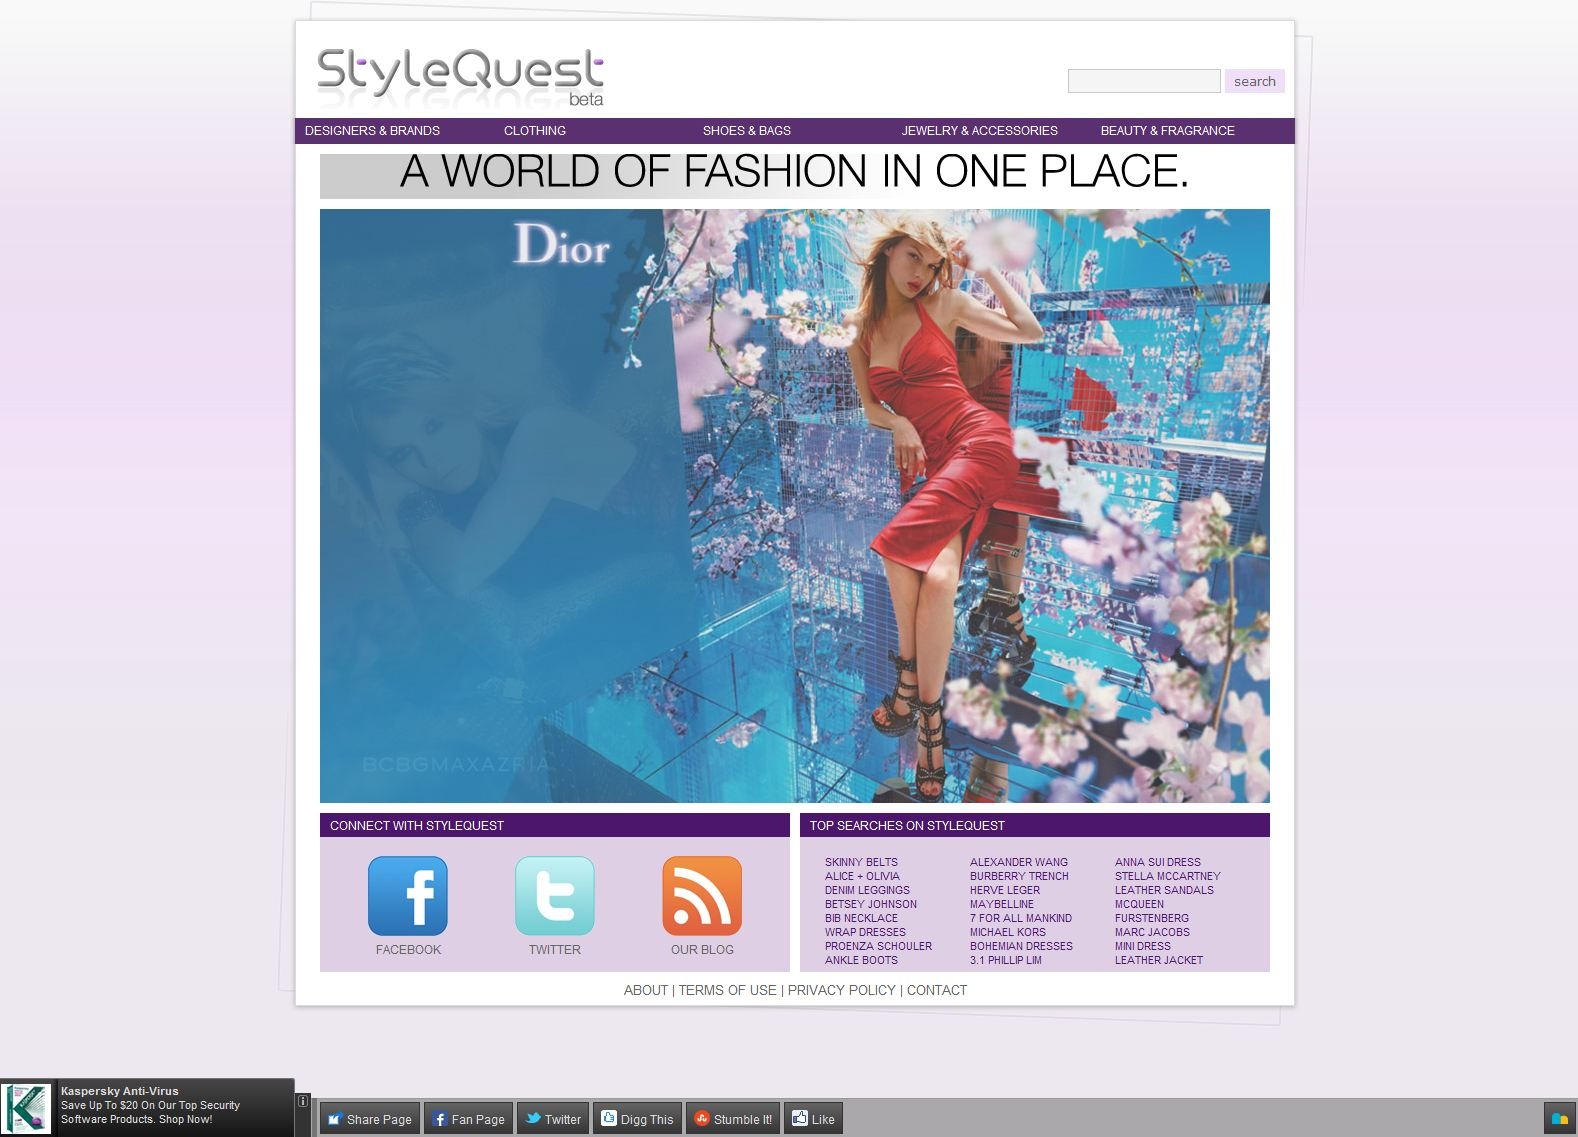 StyleQuest